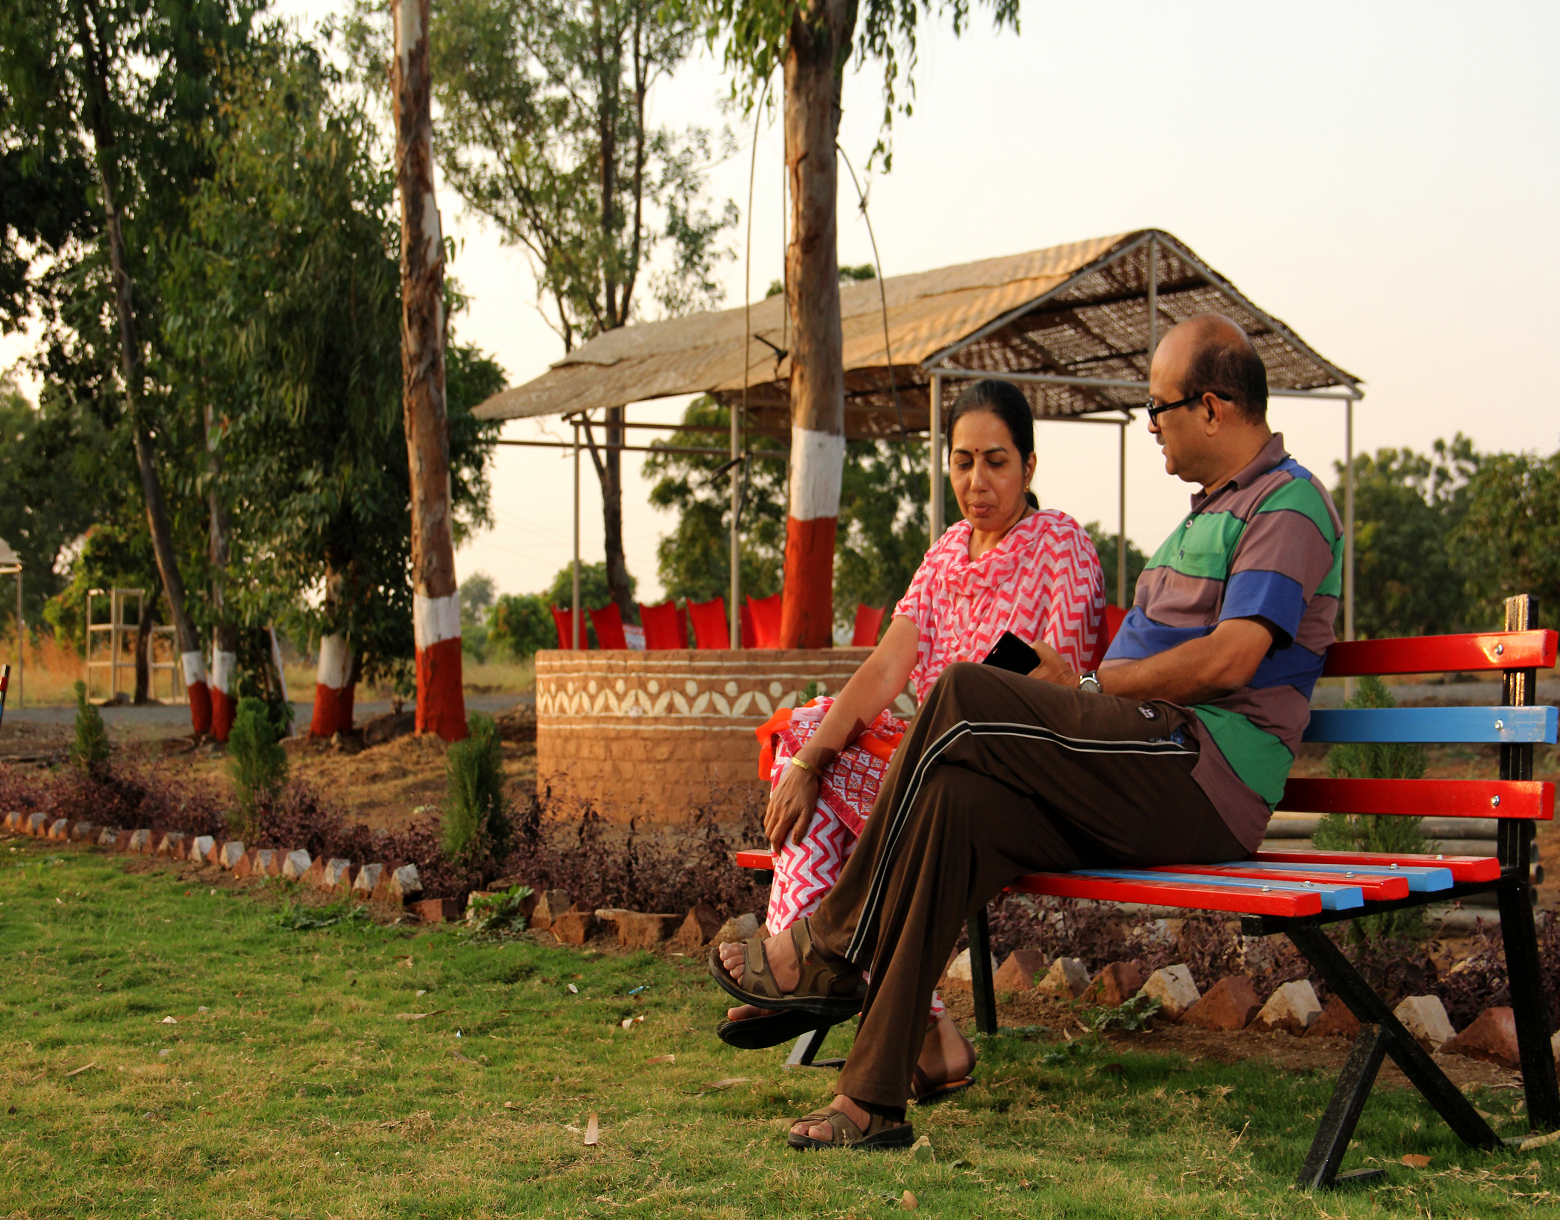 picnic spot in aurangabad